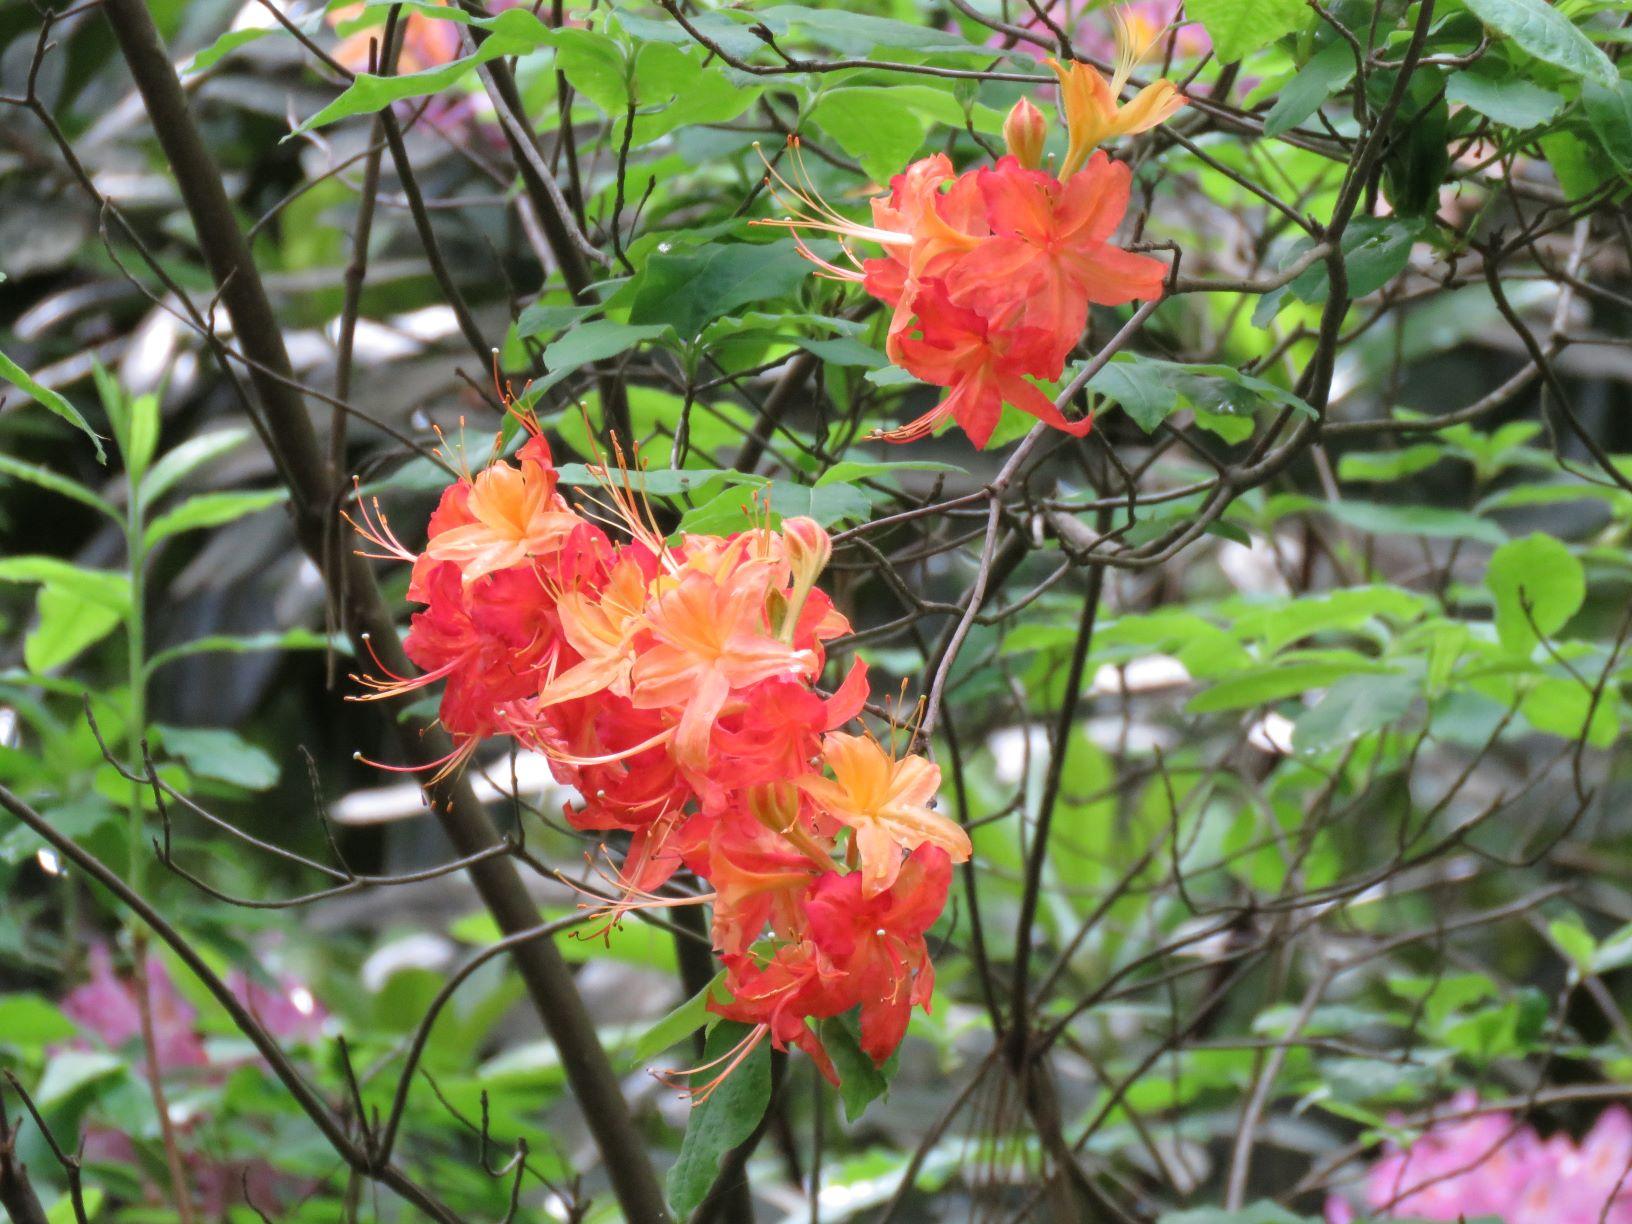 lannon flame azalea blomquist 5-20-16